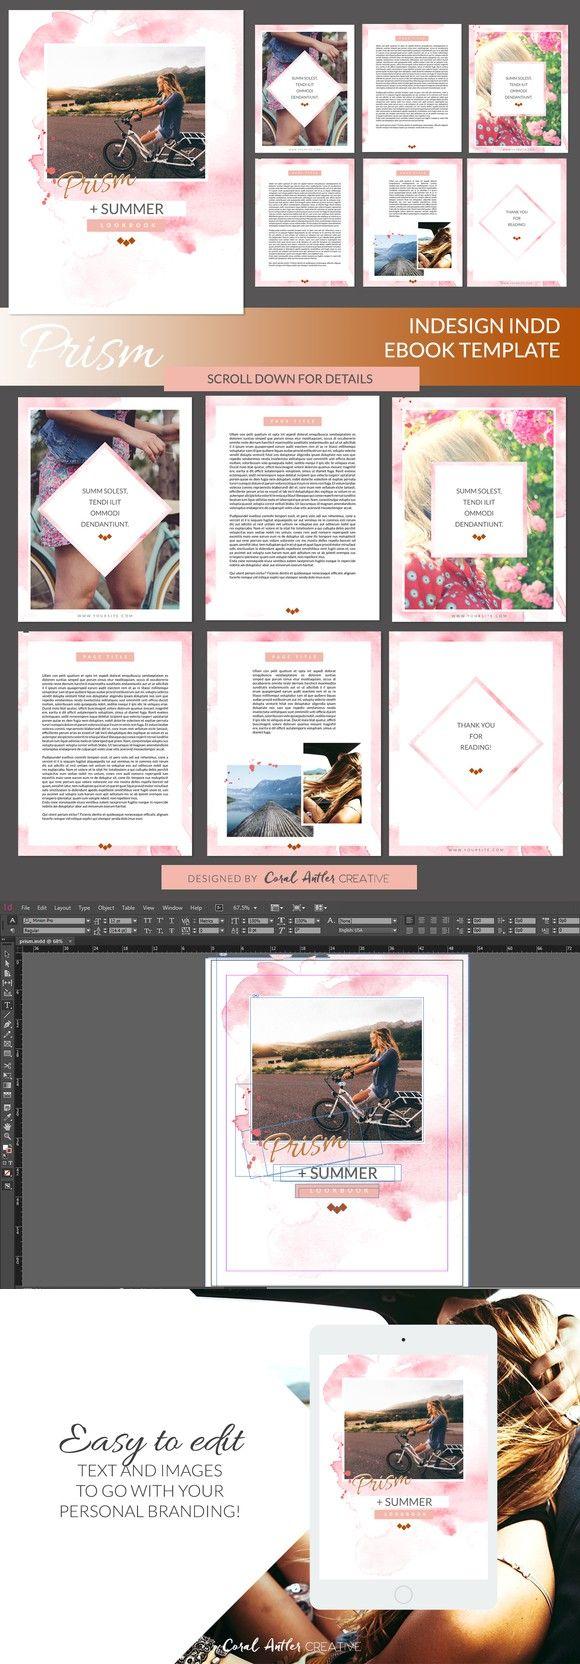 Prism Indesign Ebook Template Presentation Templates Pinterest